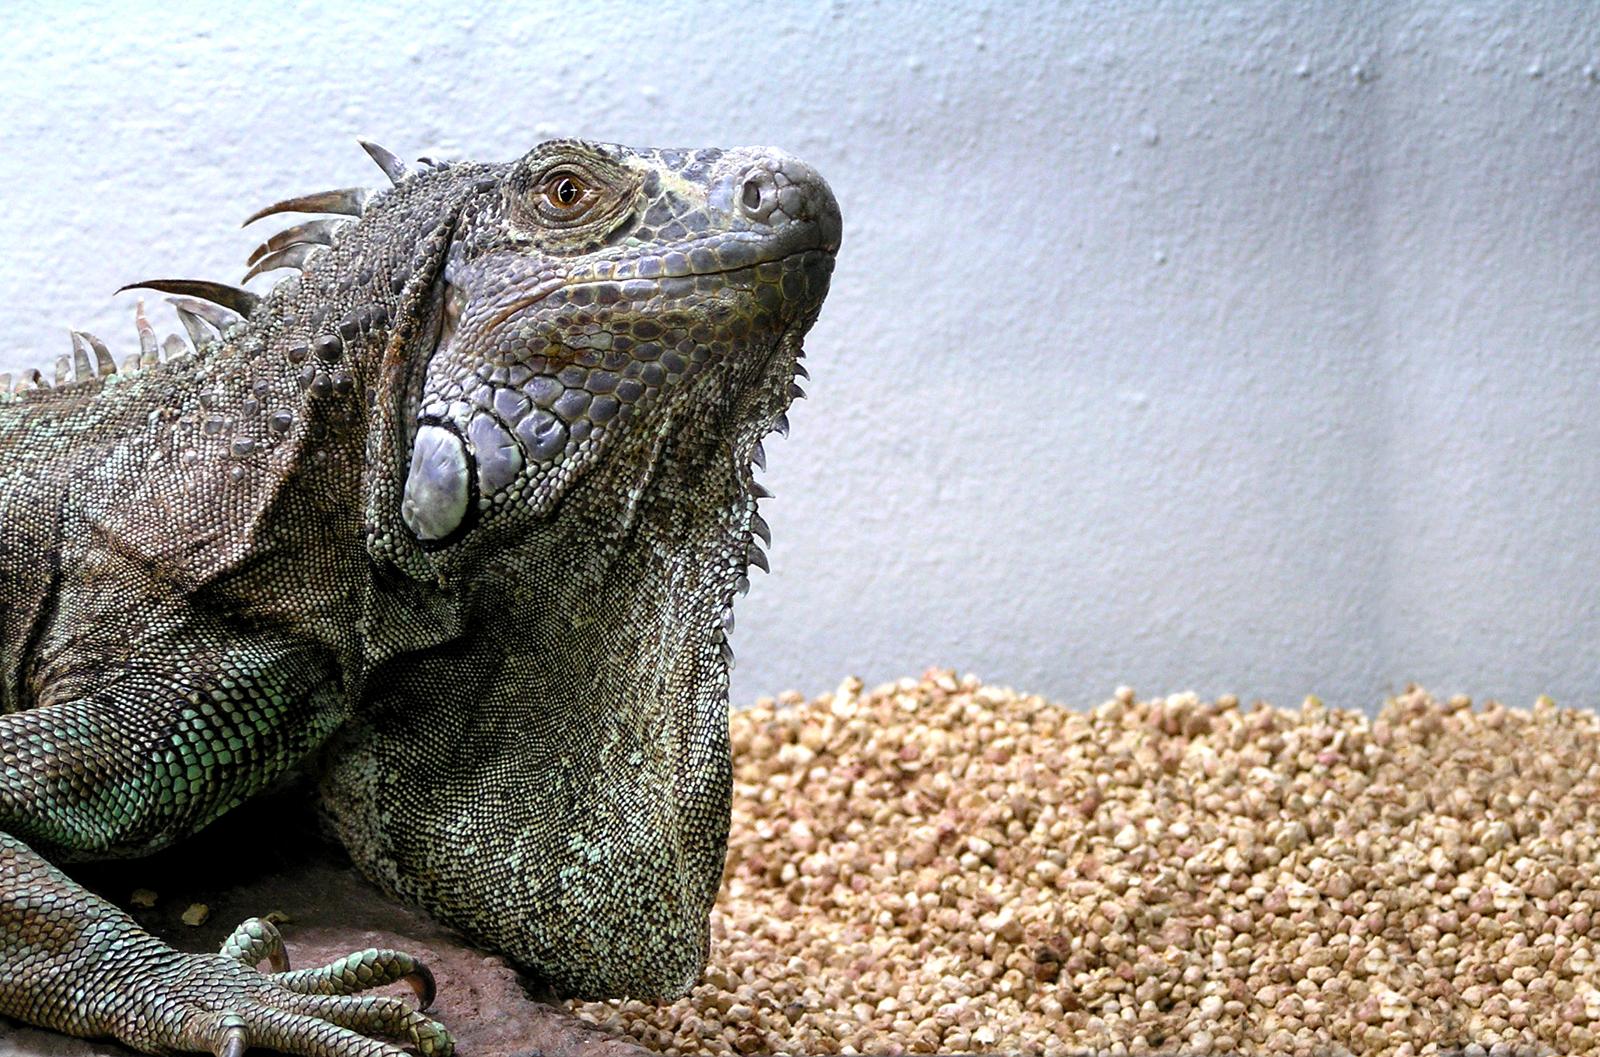 Iguana, Animal, Bspo06, Lizard, Reptile, HQ Photo